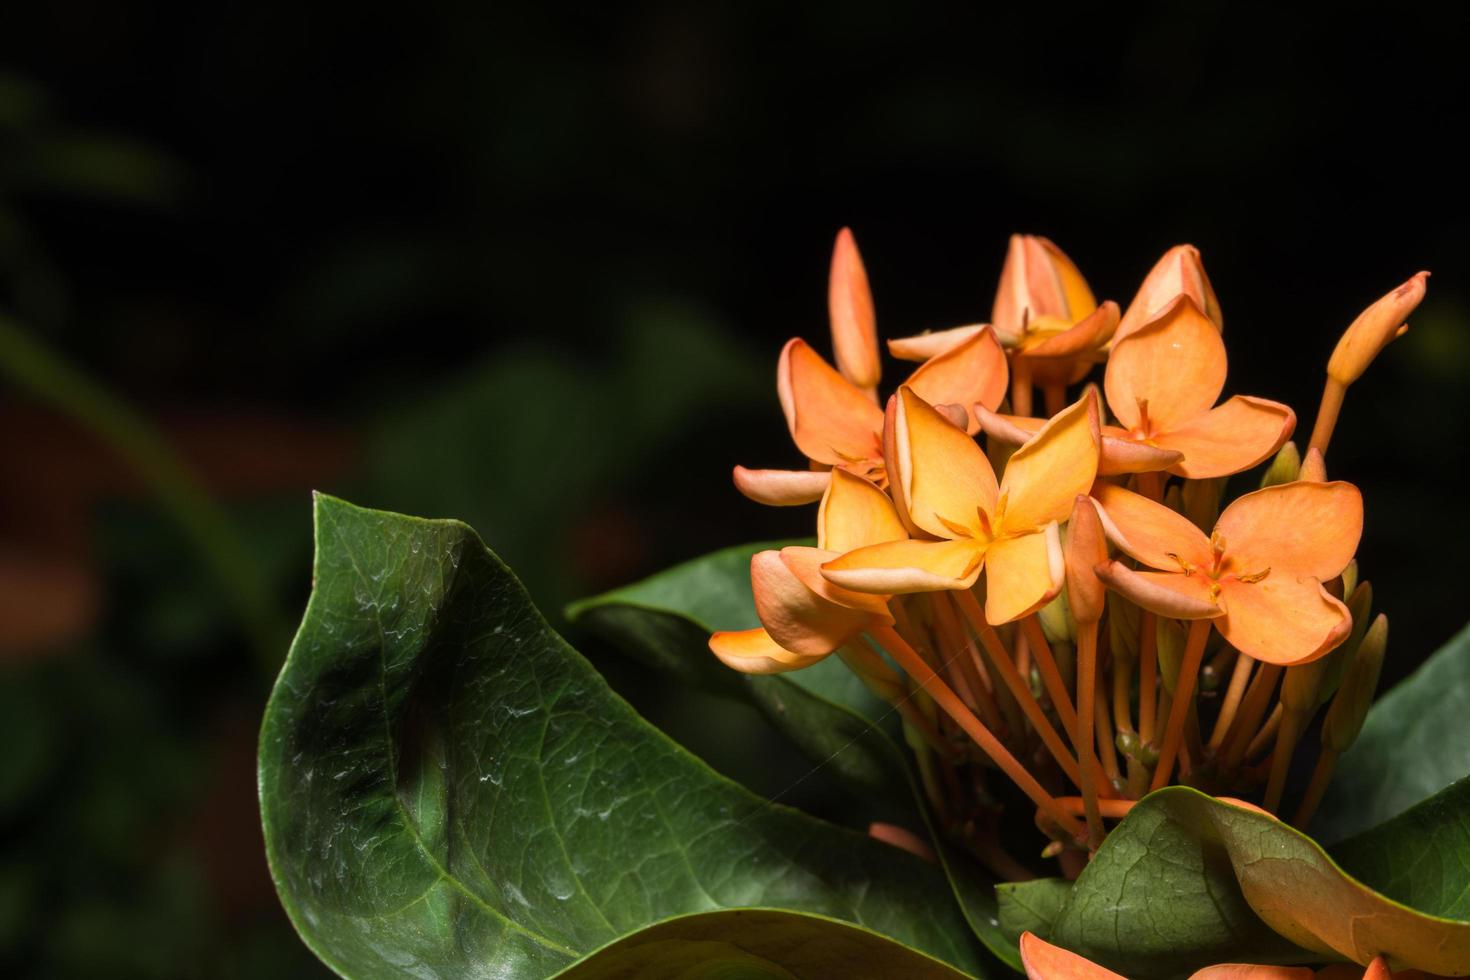 primer plano de la flor ixora foto